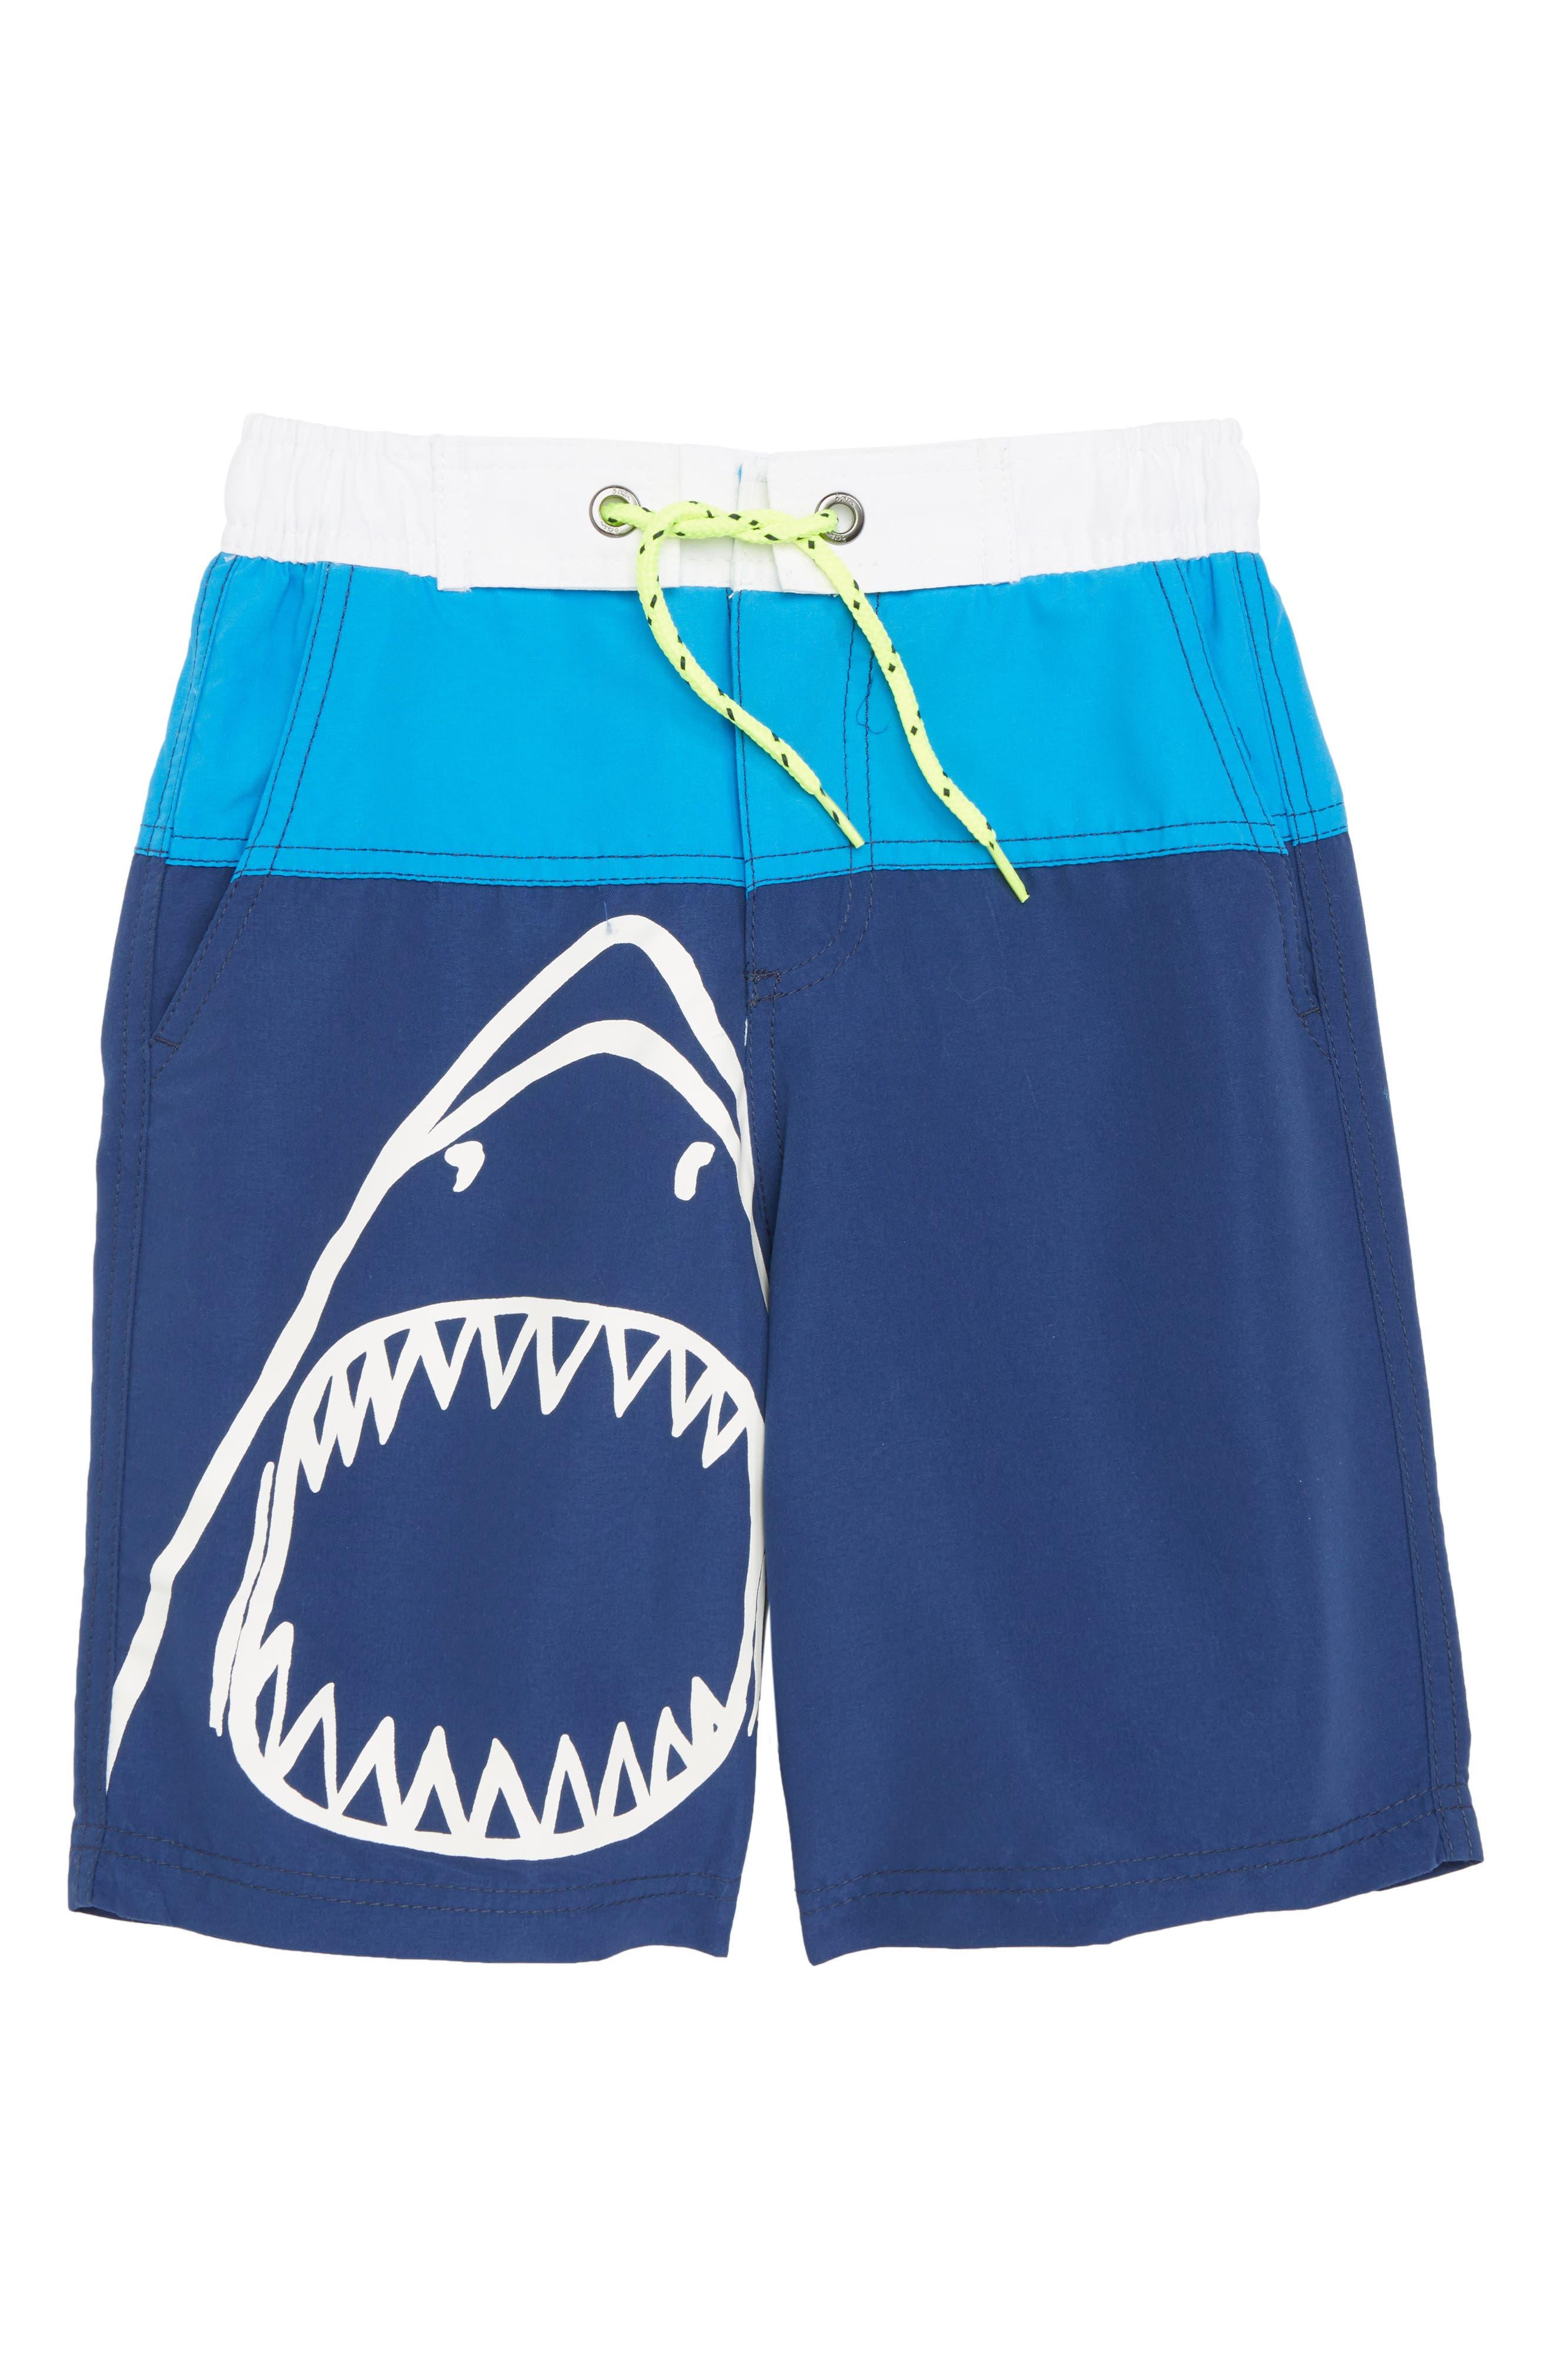 Shark Board Shorts,                         Main,                         color, Electric Blue Lemonade